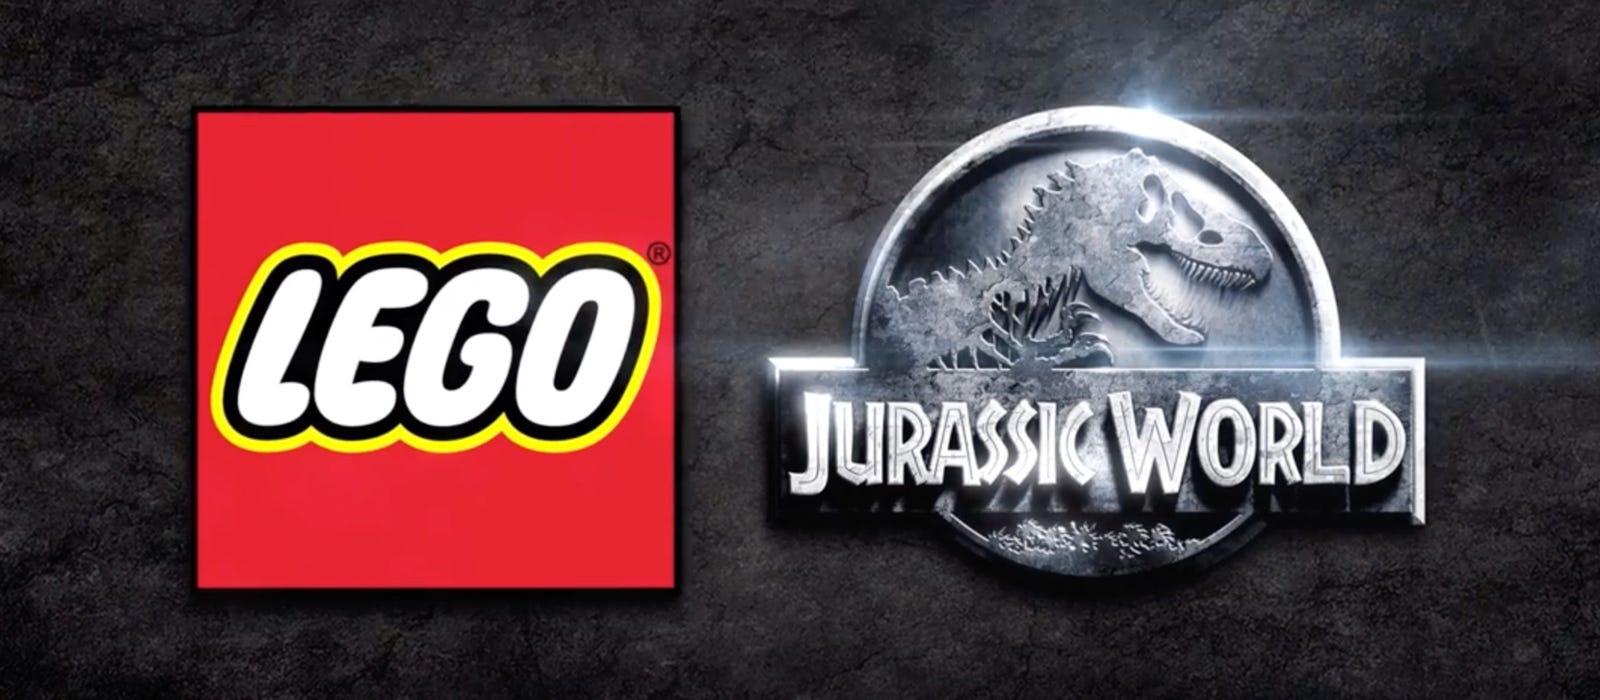 Jurassic World Videogame Video image